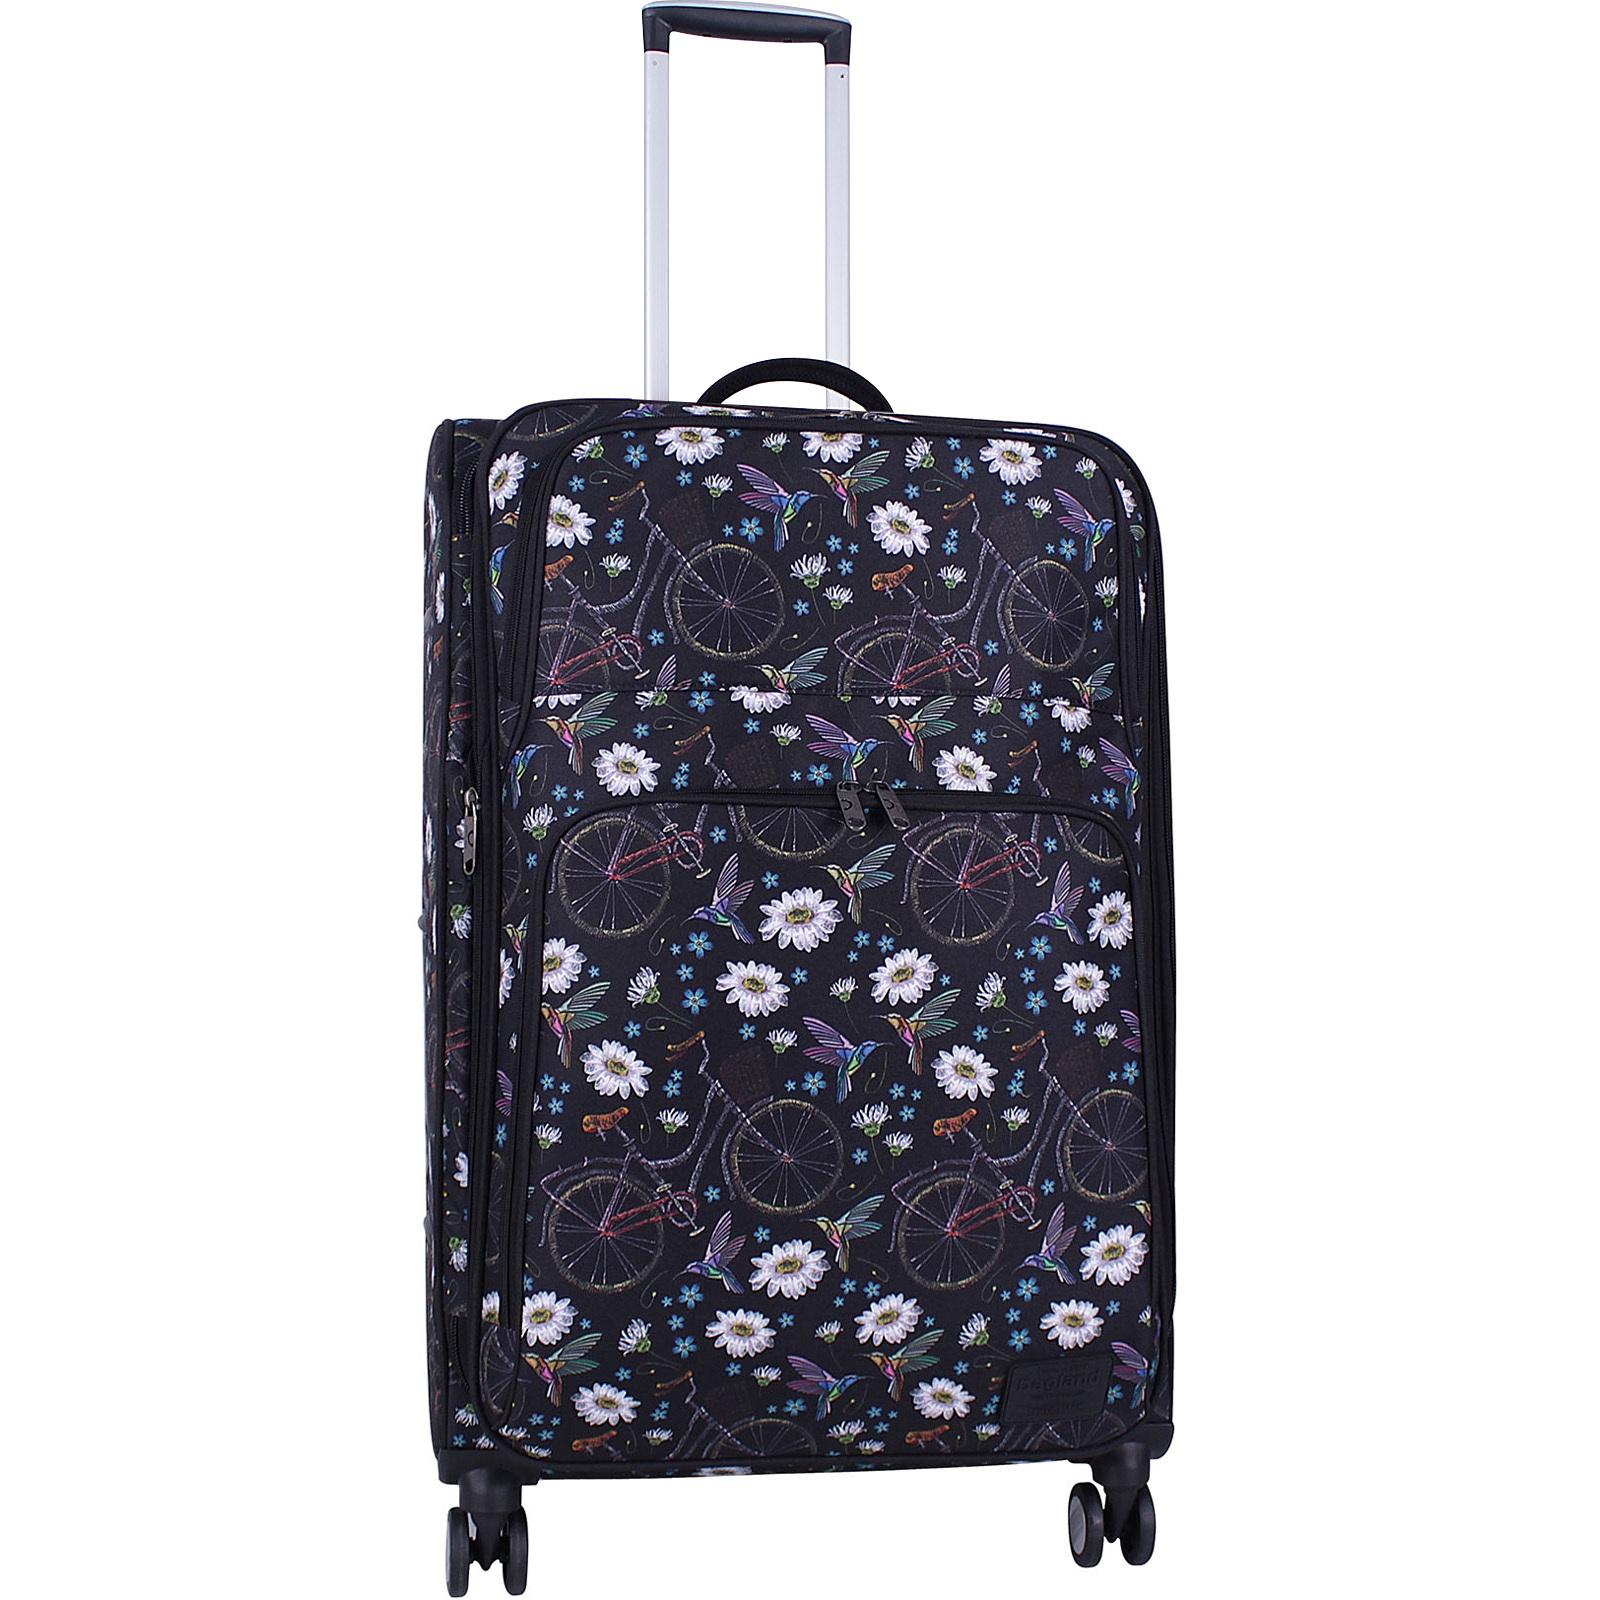 Дорожные чемоданы Чемодан Bagland Валенсия большой дизайн 83л. сублімація 194 (0037966274) IMG_8704_суб194._.JPG